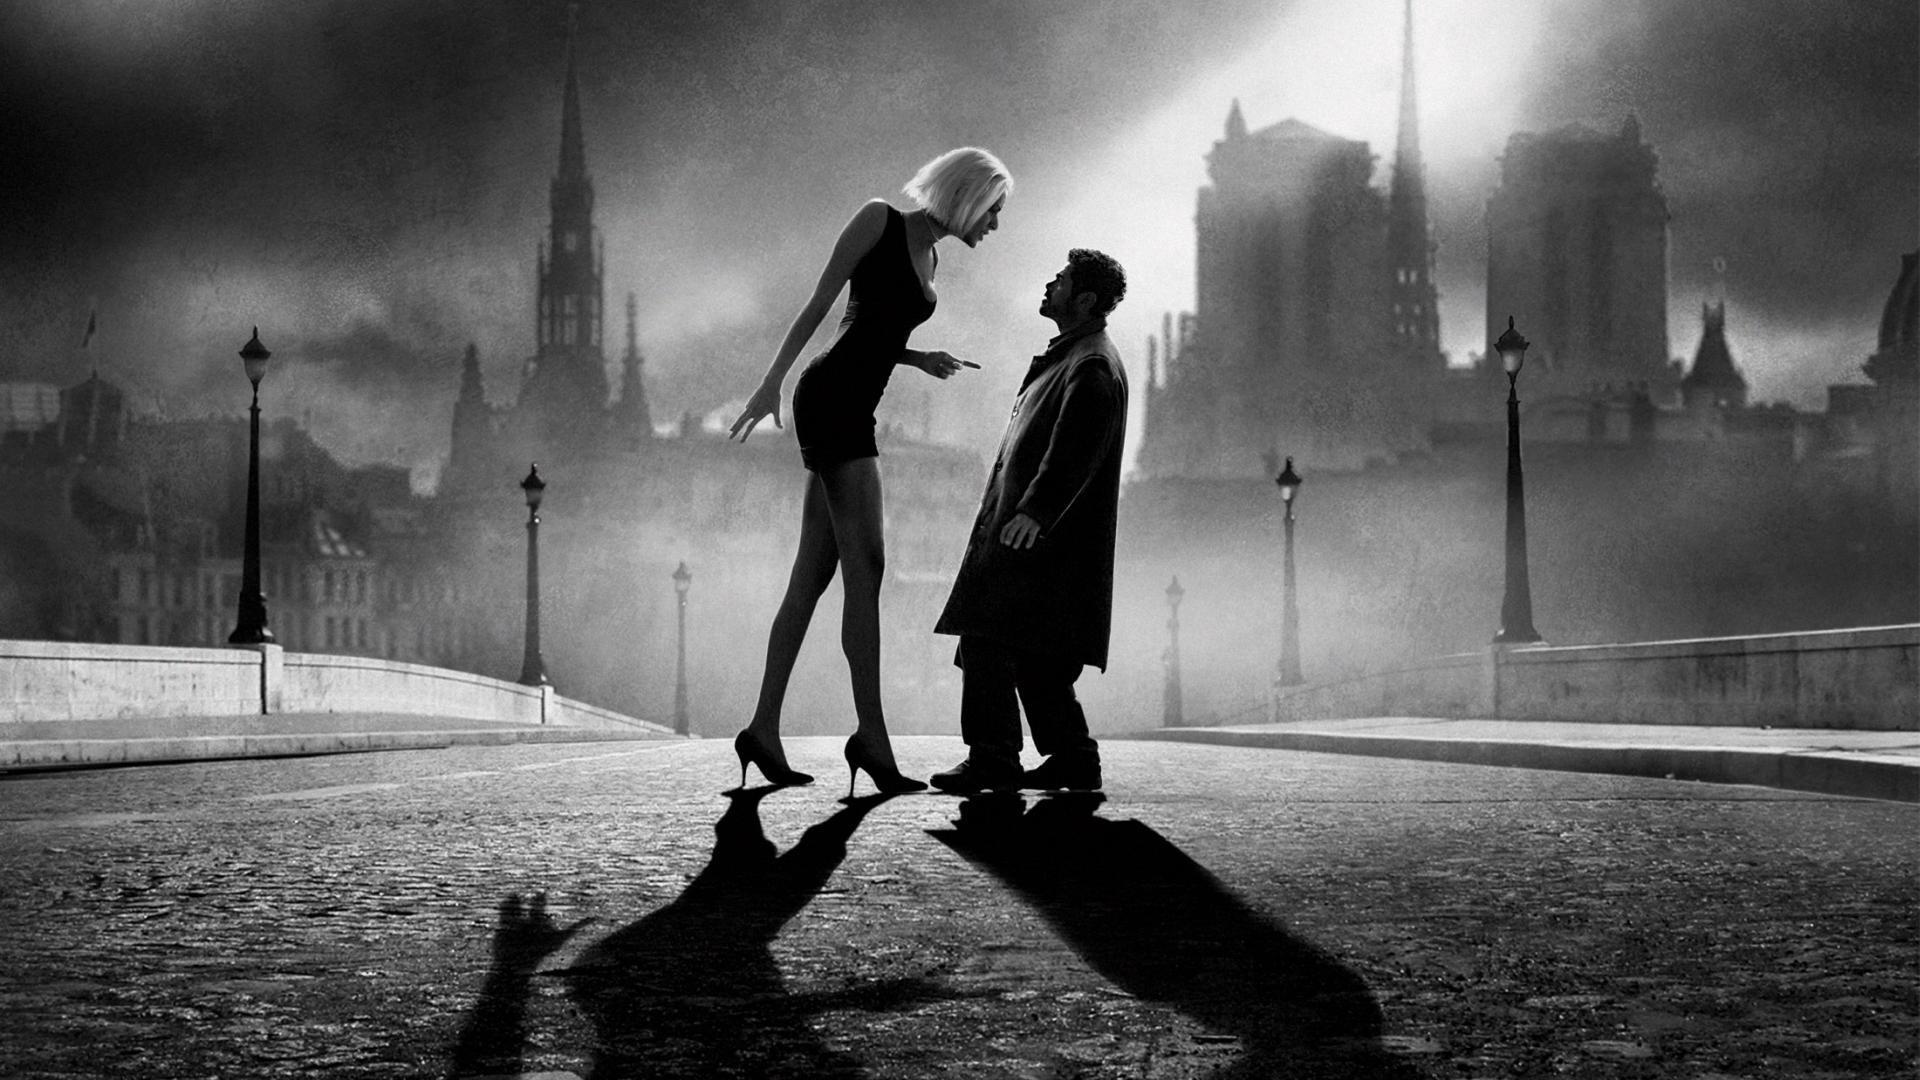 Angel-A: la vita, l'amore e Parigi